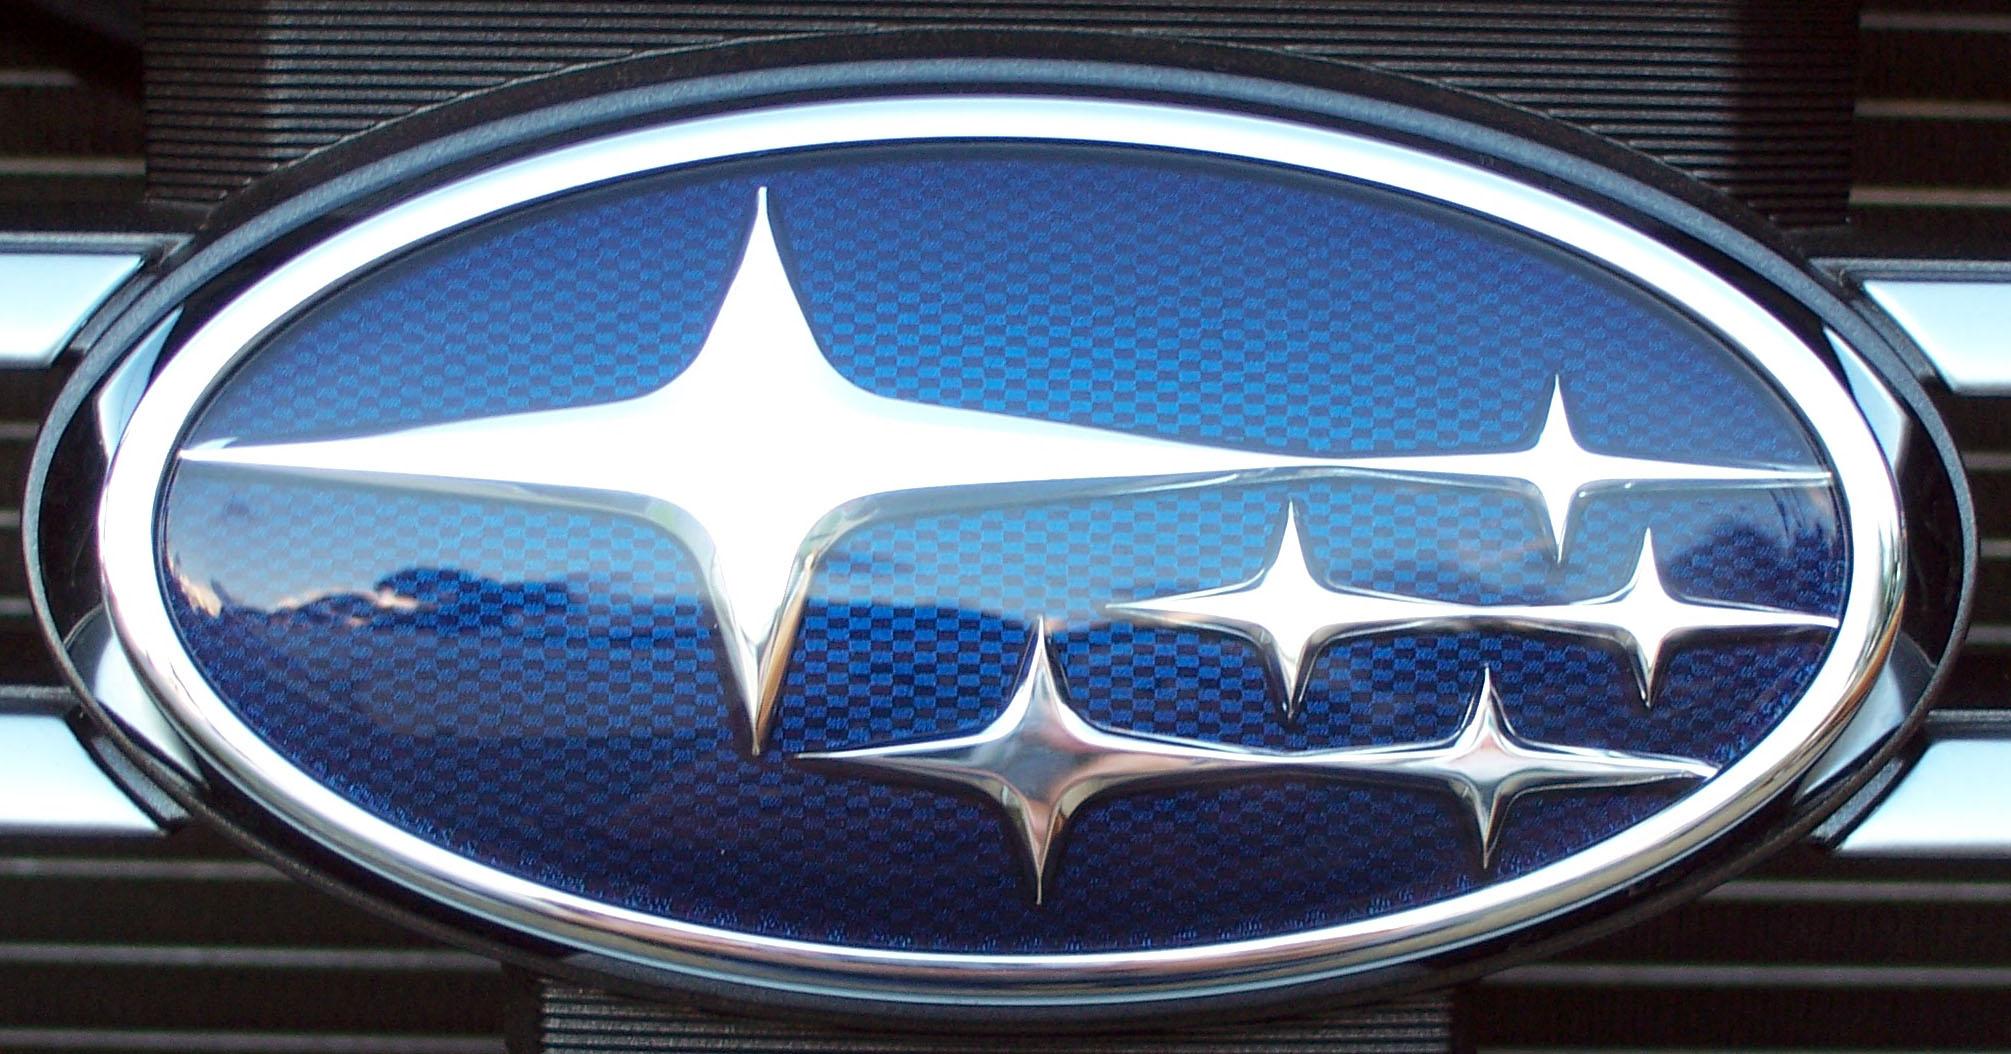 Subaru Logo, Subaru Car Symbol Meaning and History.